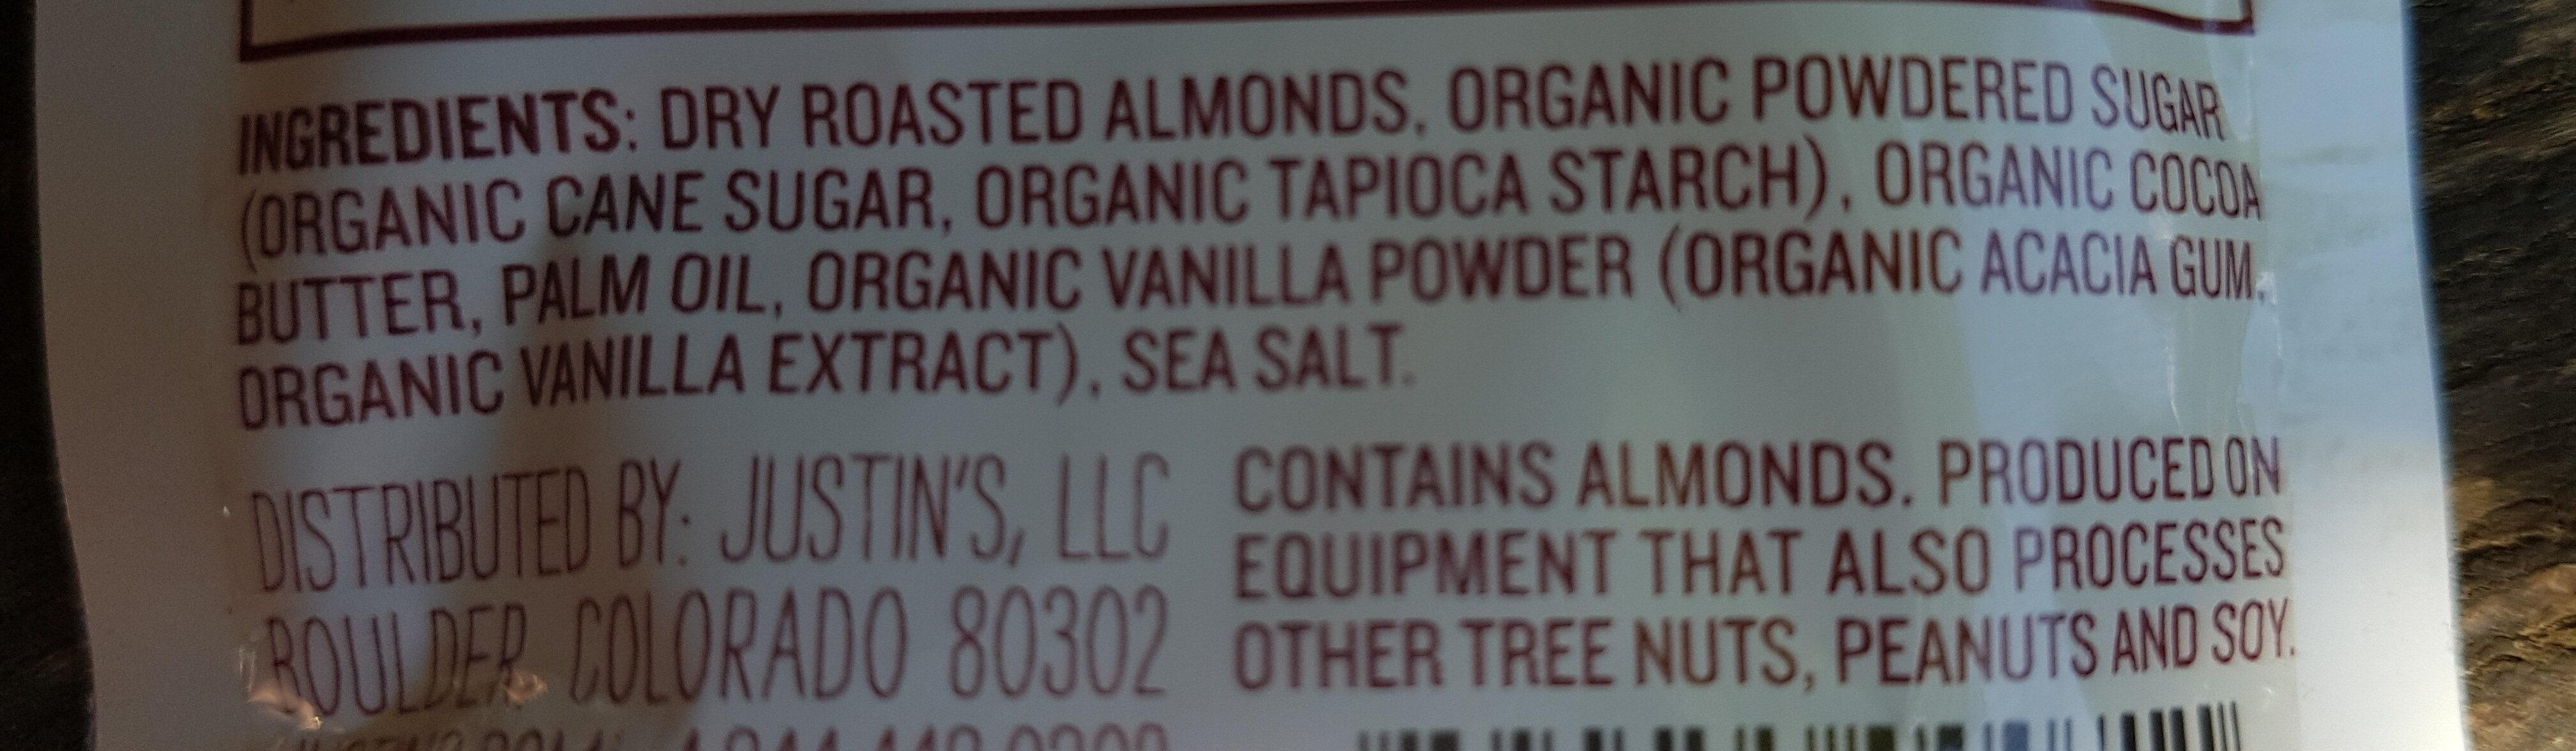 Almond Butter, Vanilla - Ingredients - en